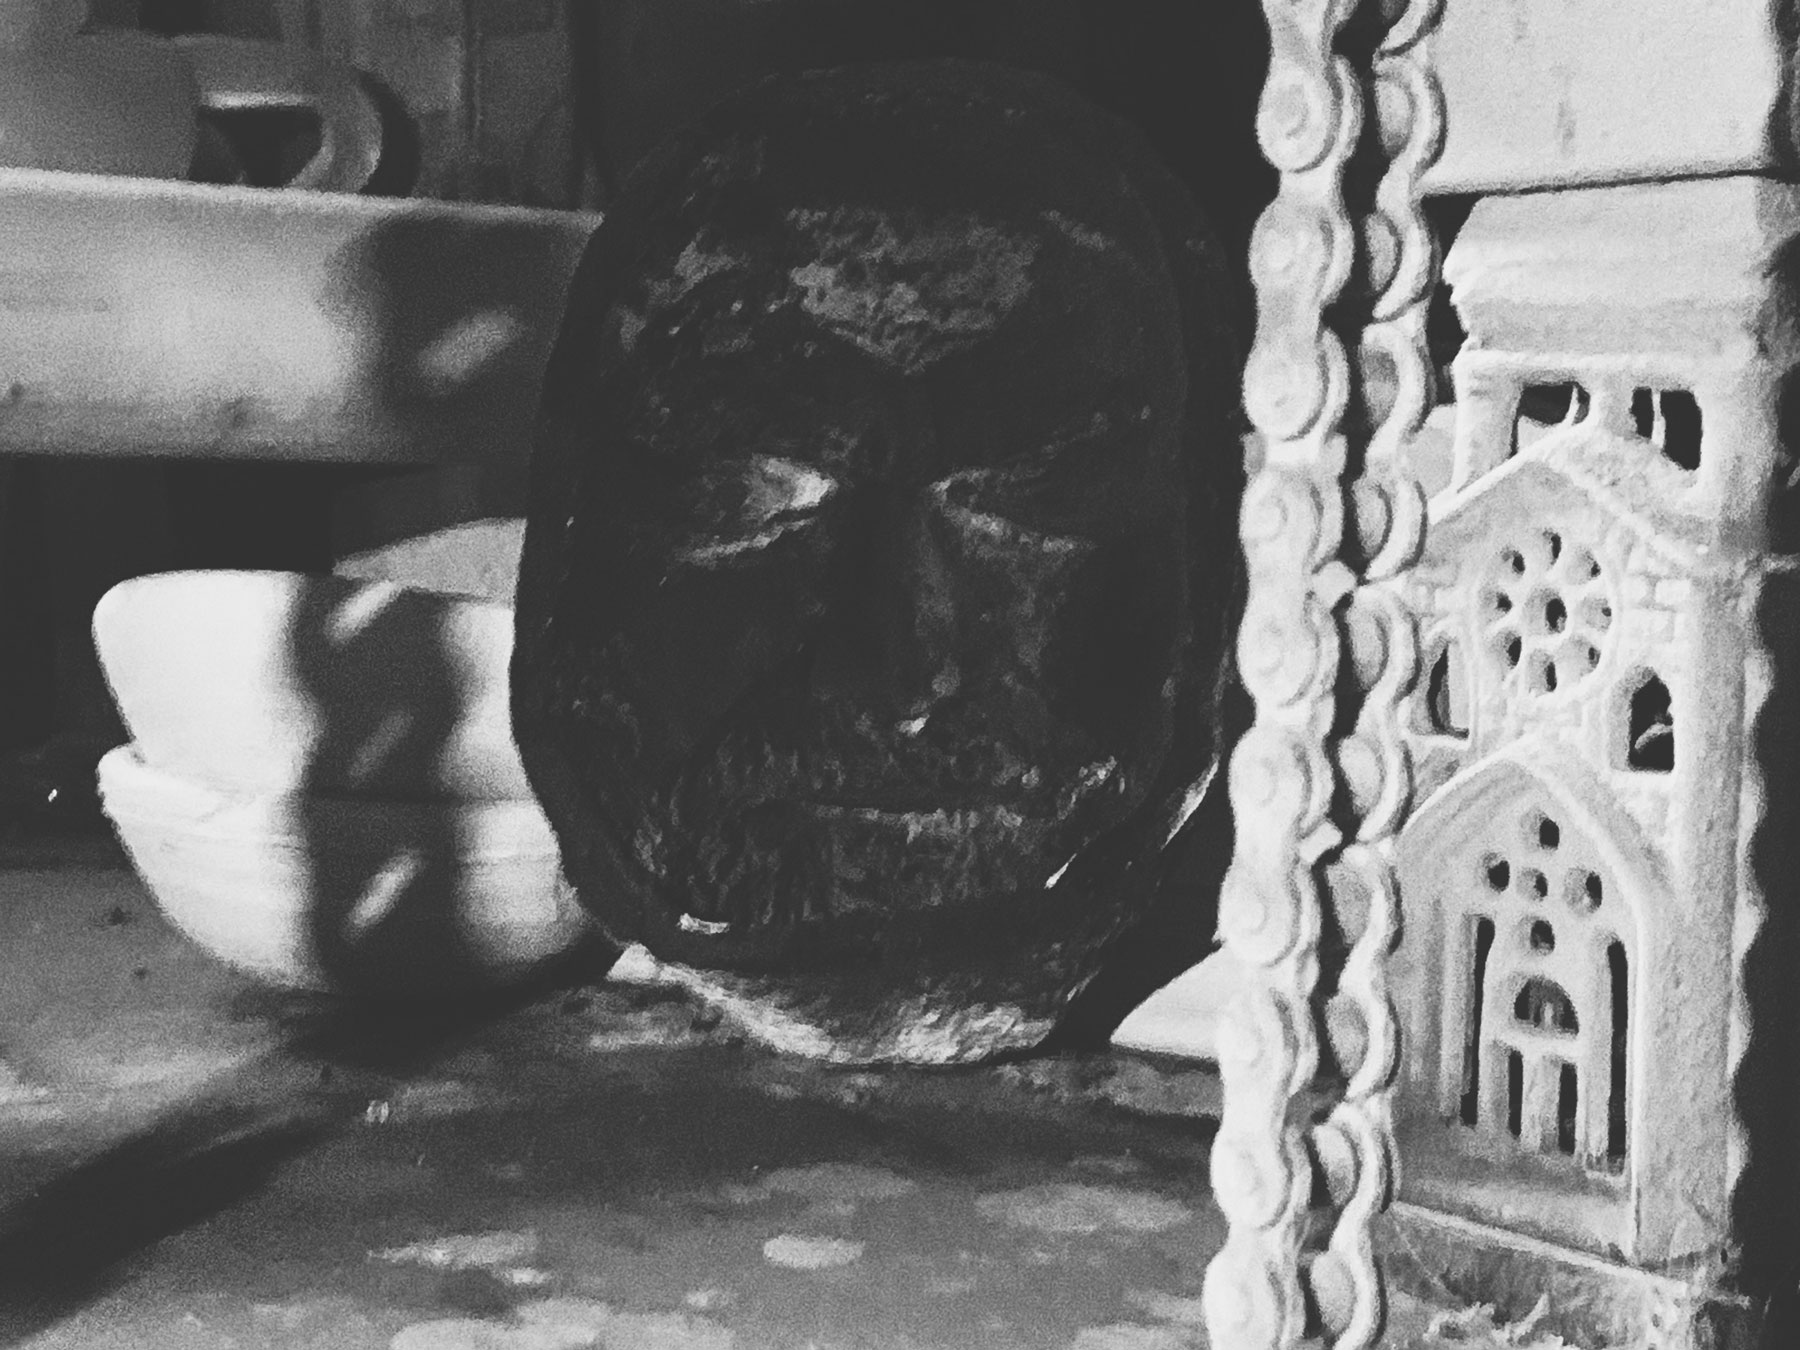 Clay mask on kiln